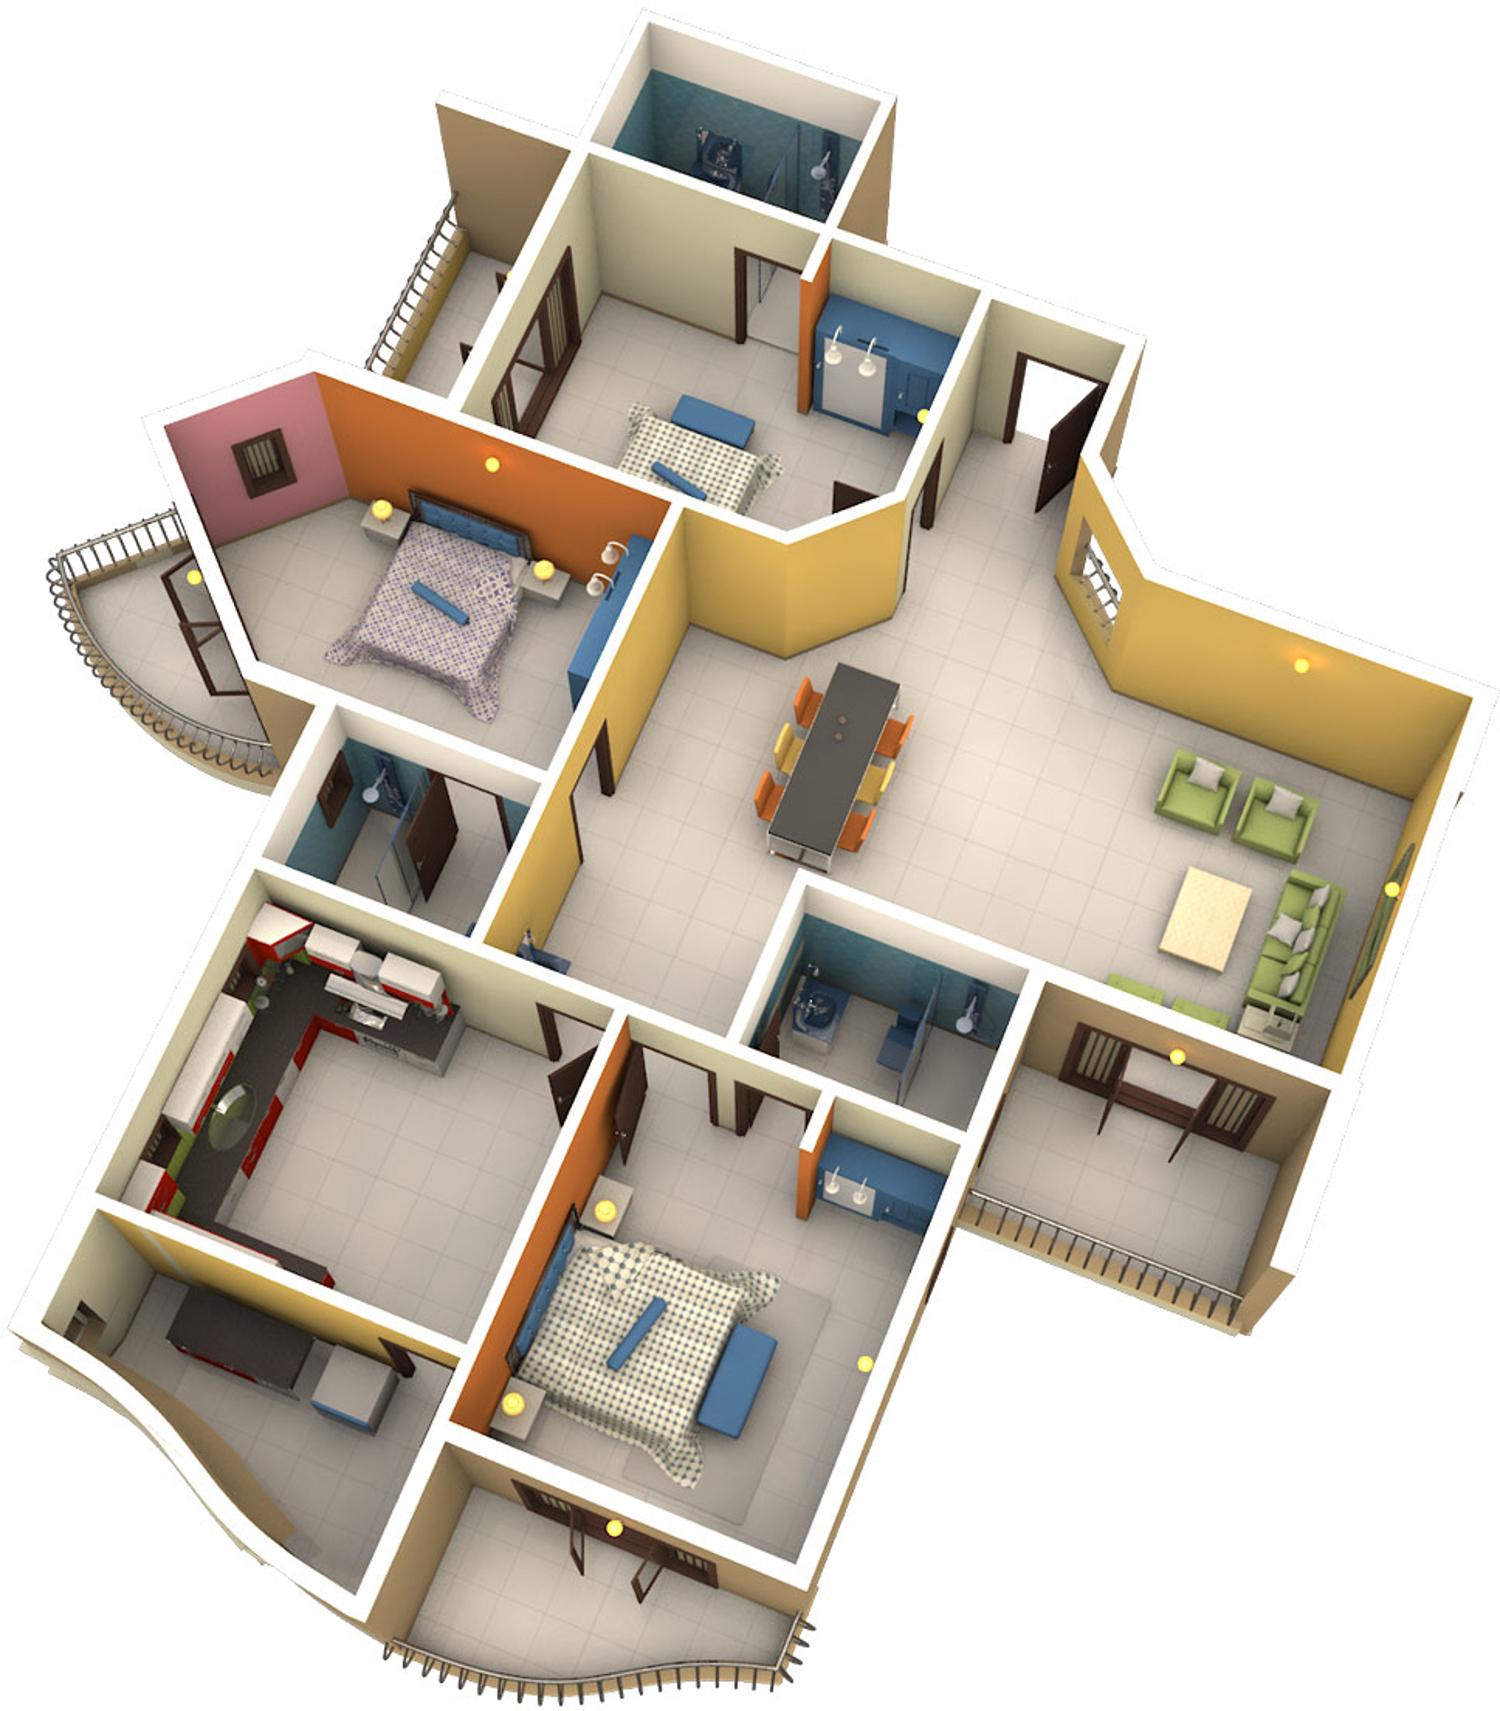 Ultima skymax in kakkanad kochi price location map for 100 floors floor 89